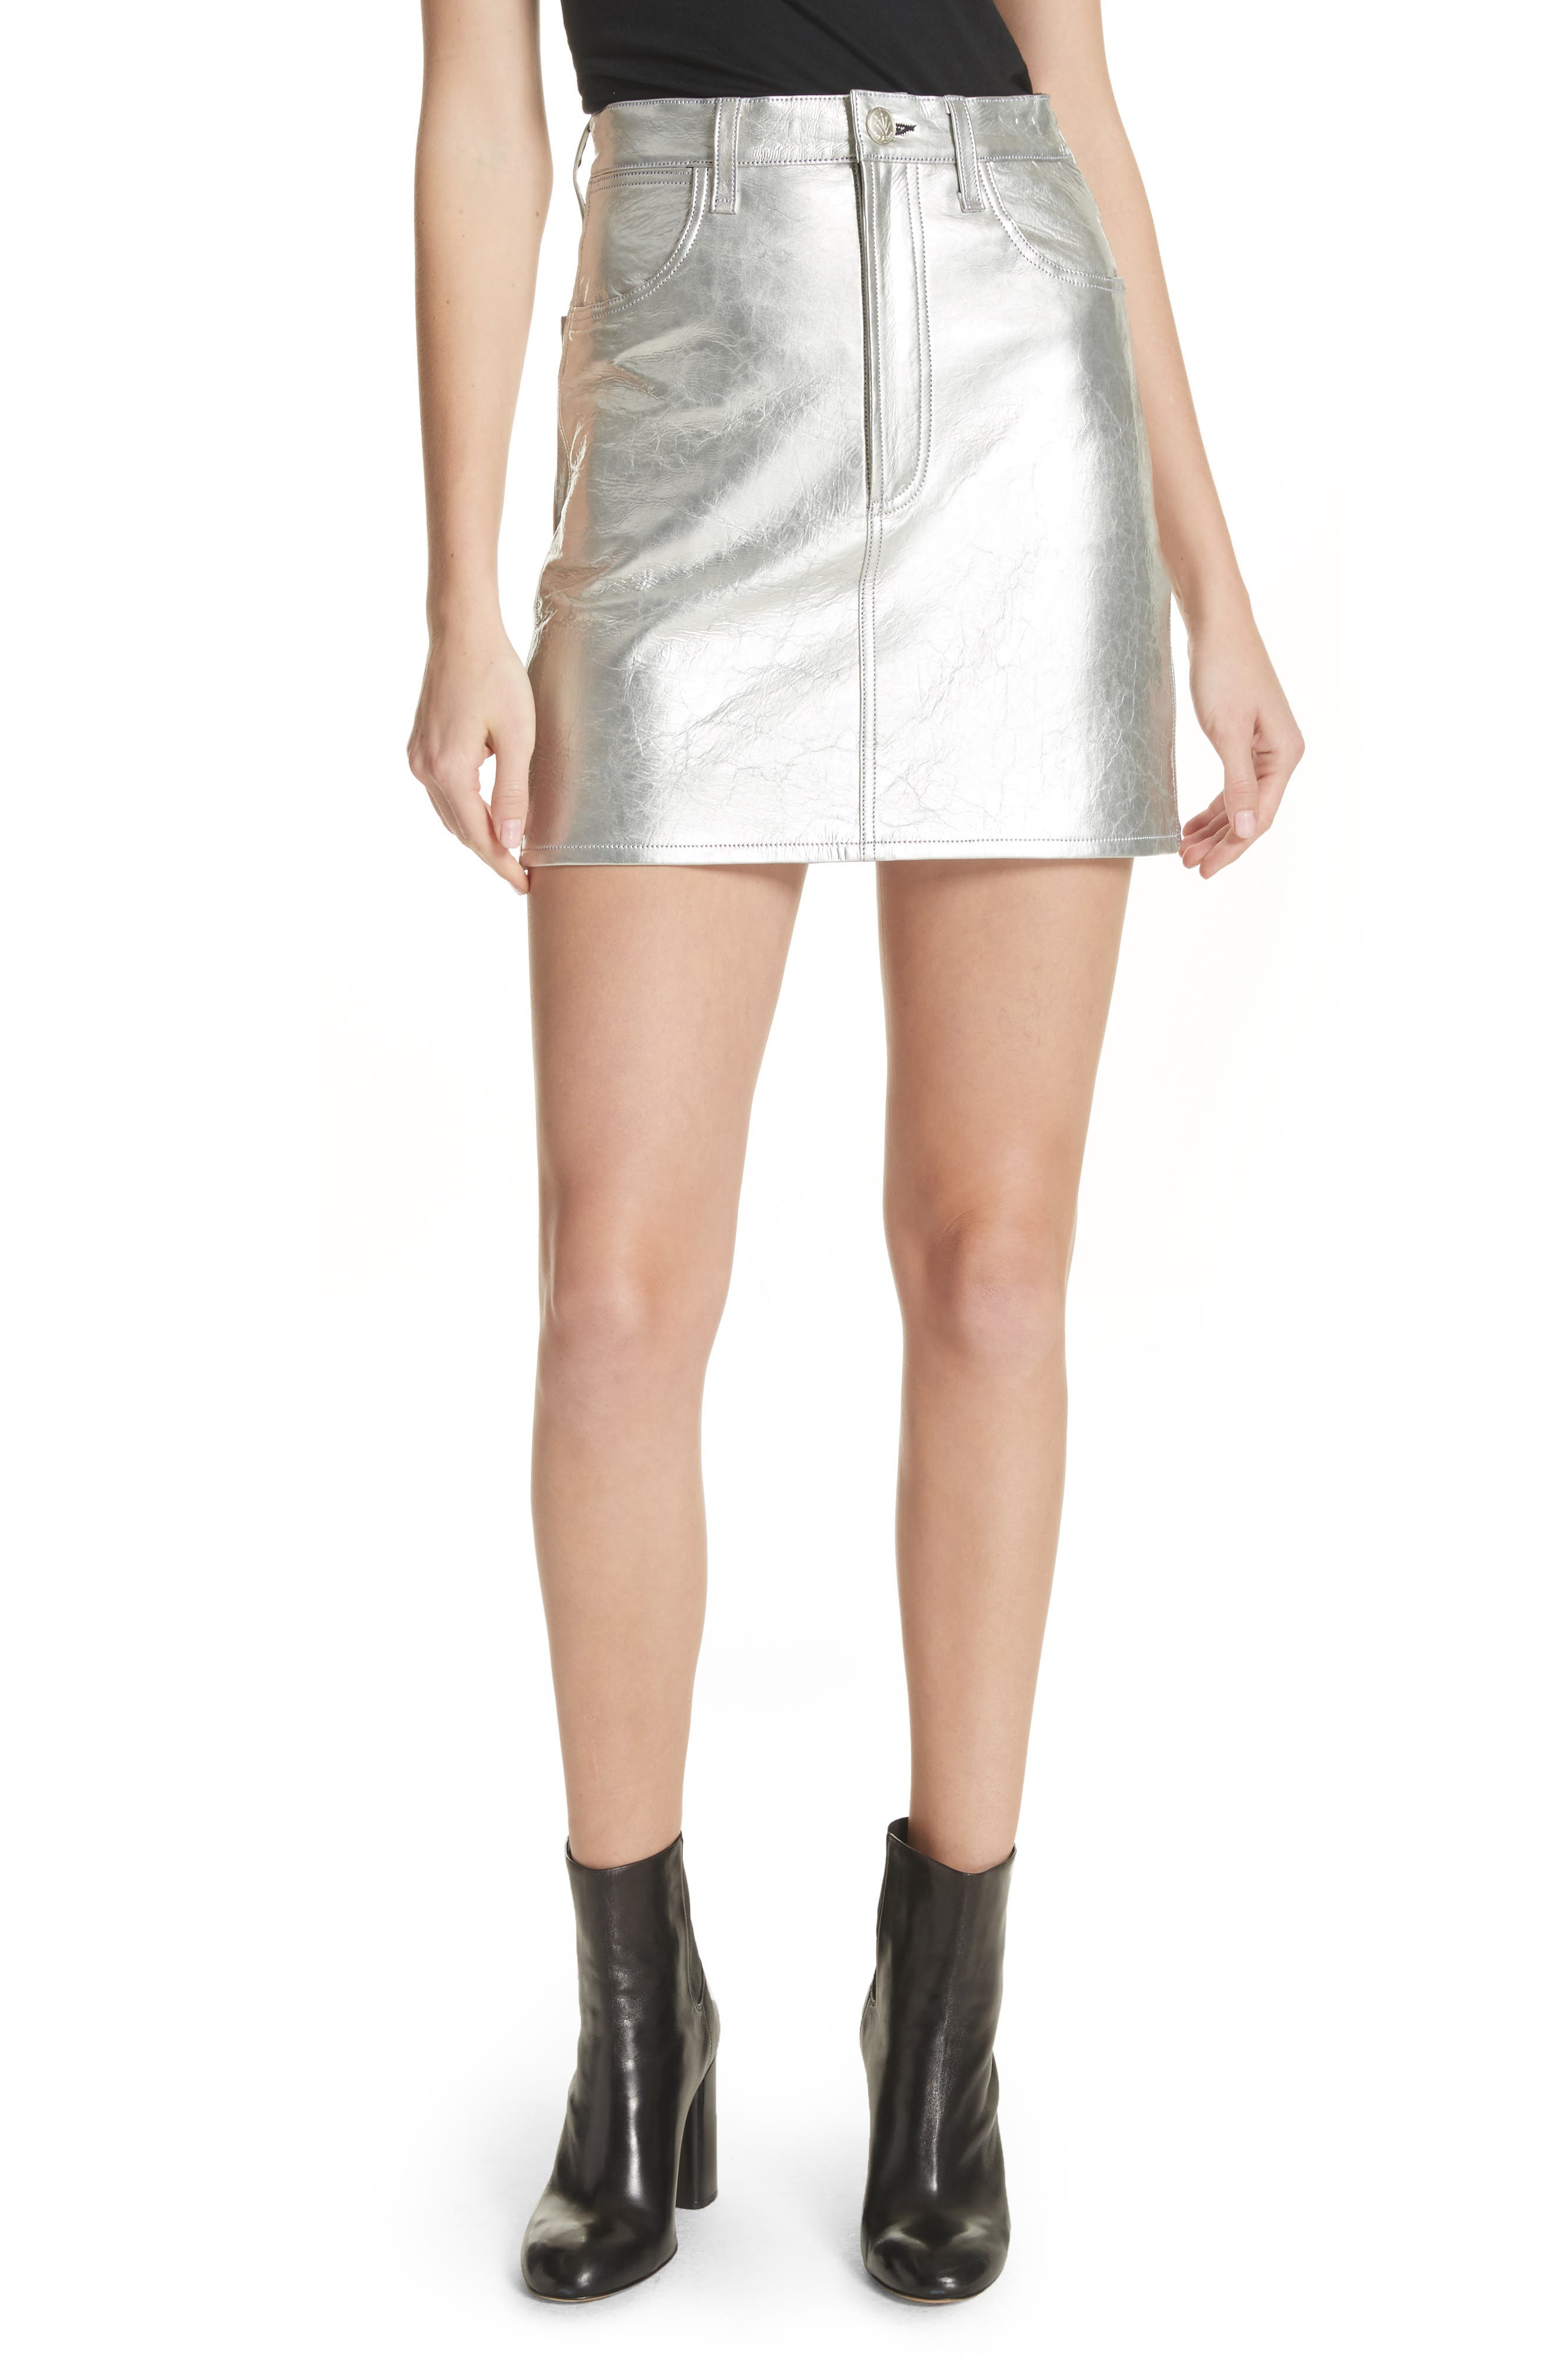 Moss High Waist Leather Miniskirt,                             Main thumbnail 1, color,                             Metallic